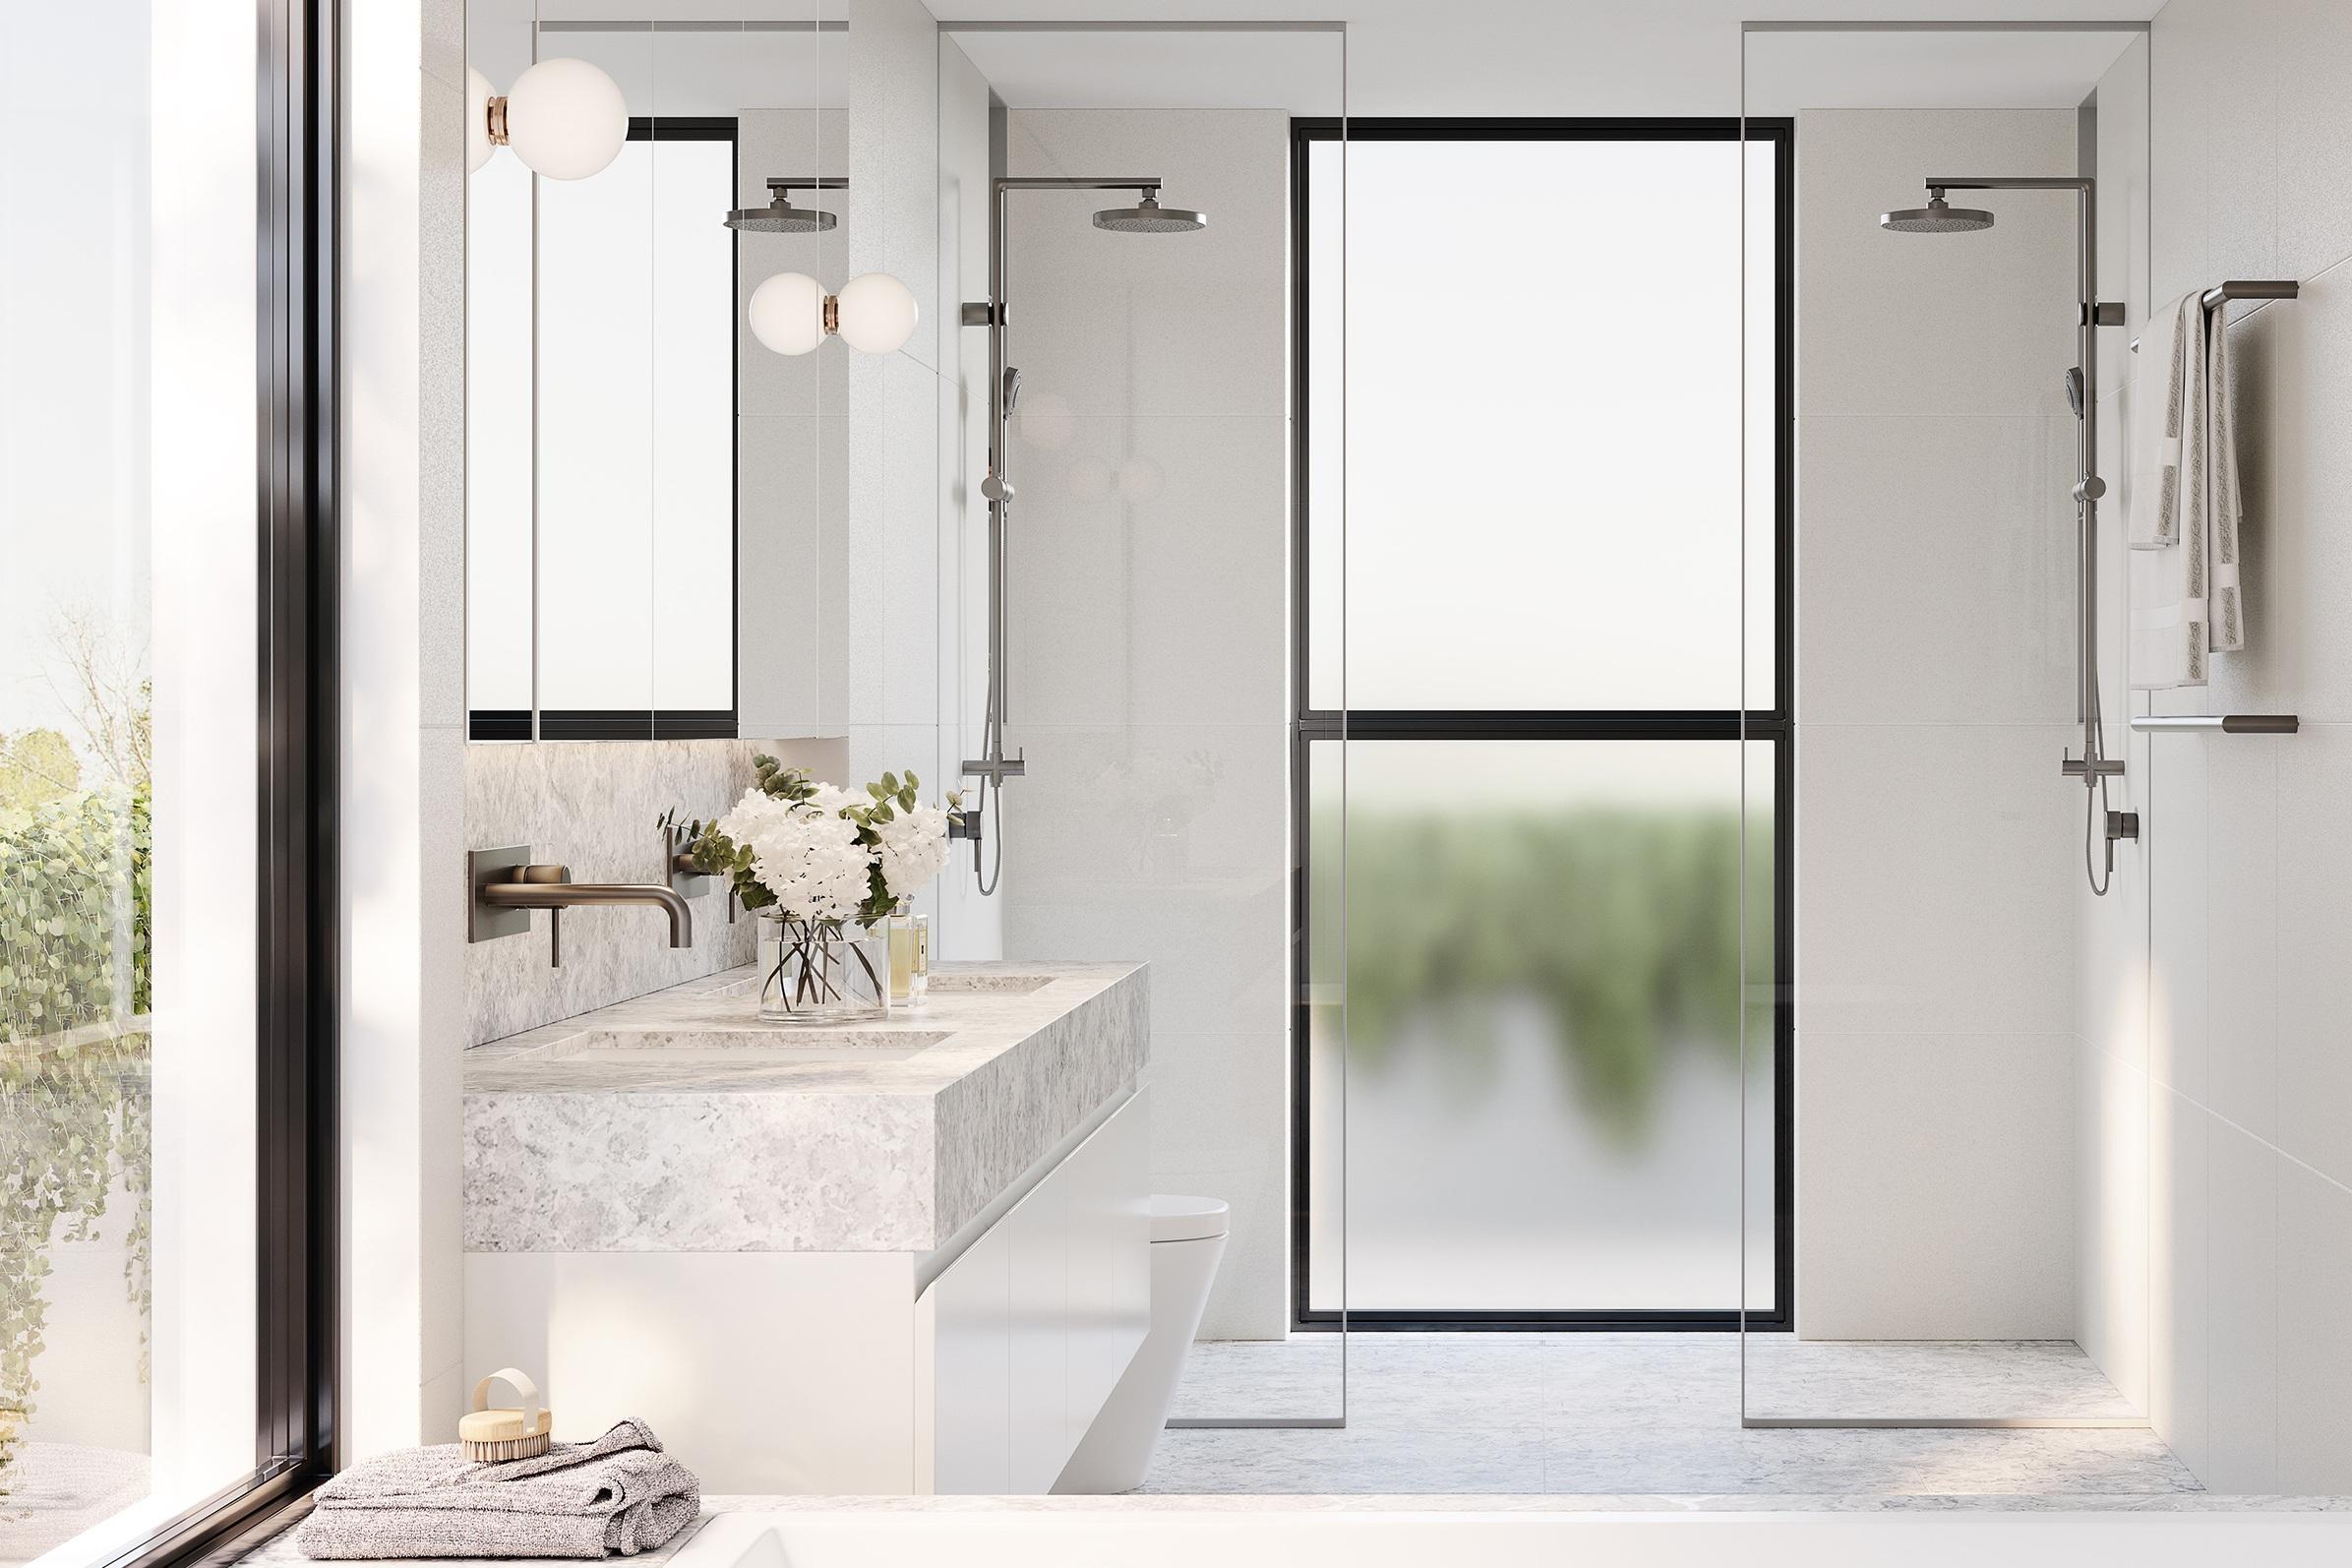 VIN03_Bathroom LR.jpg